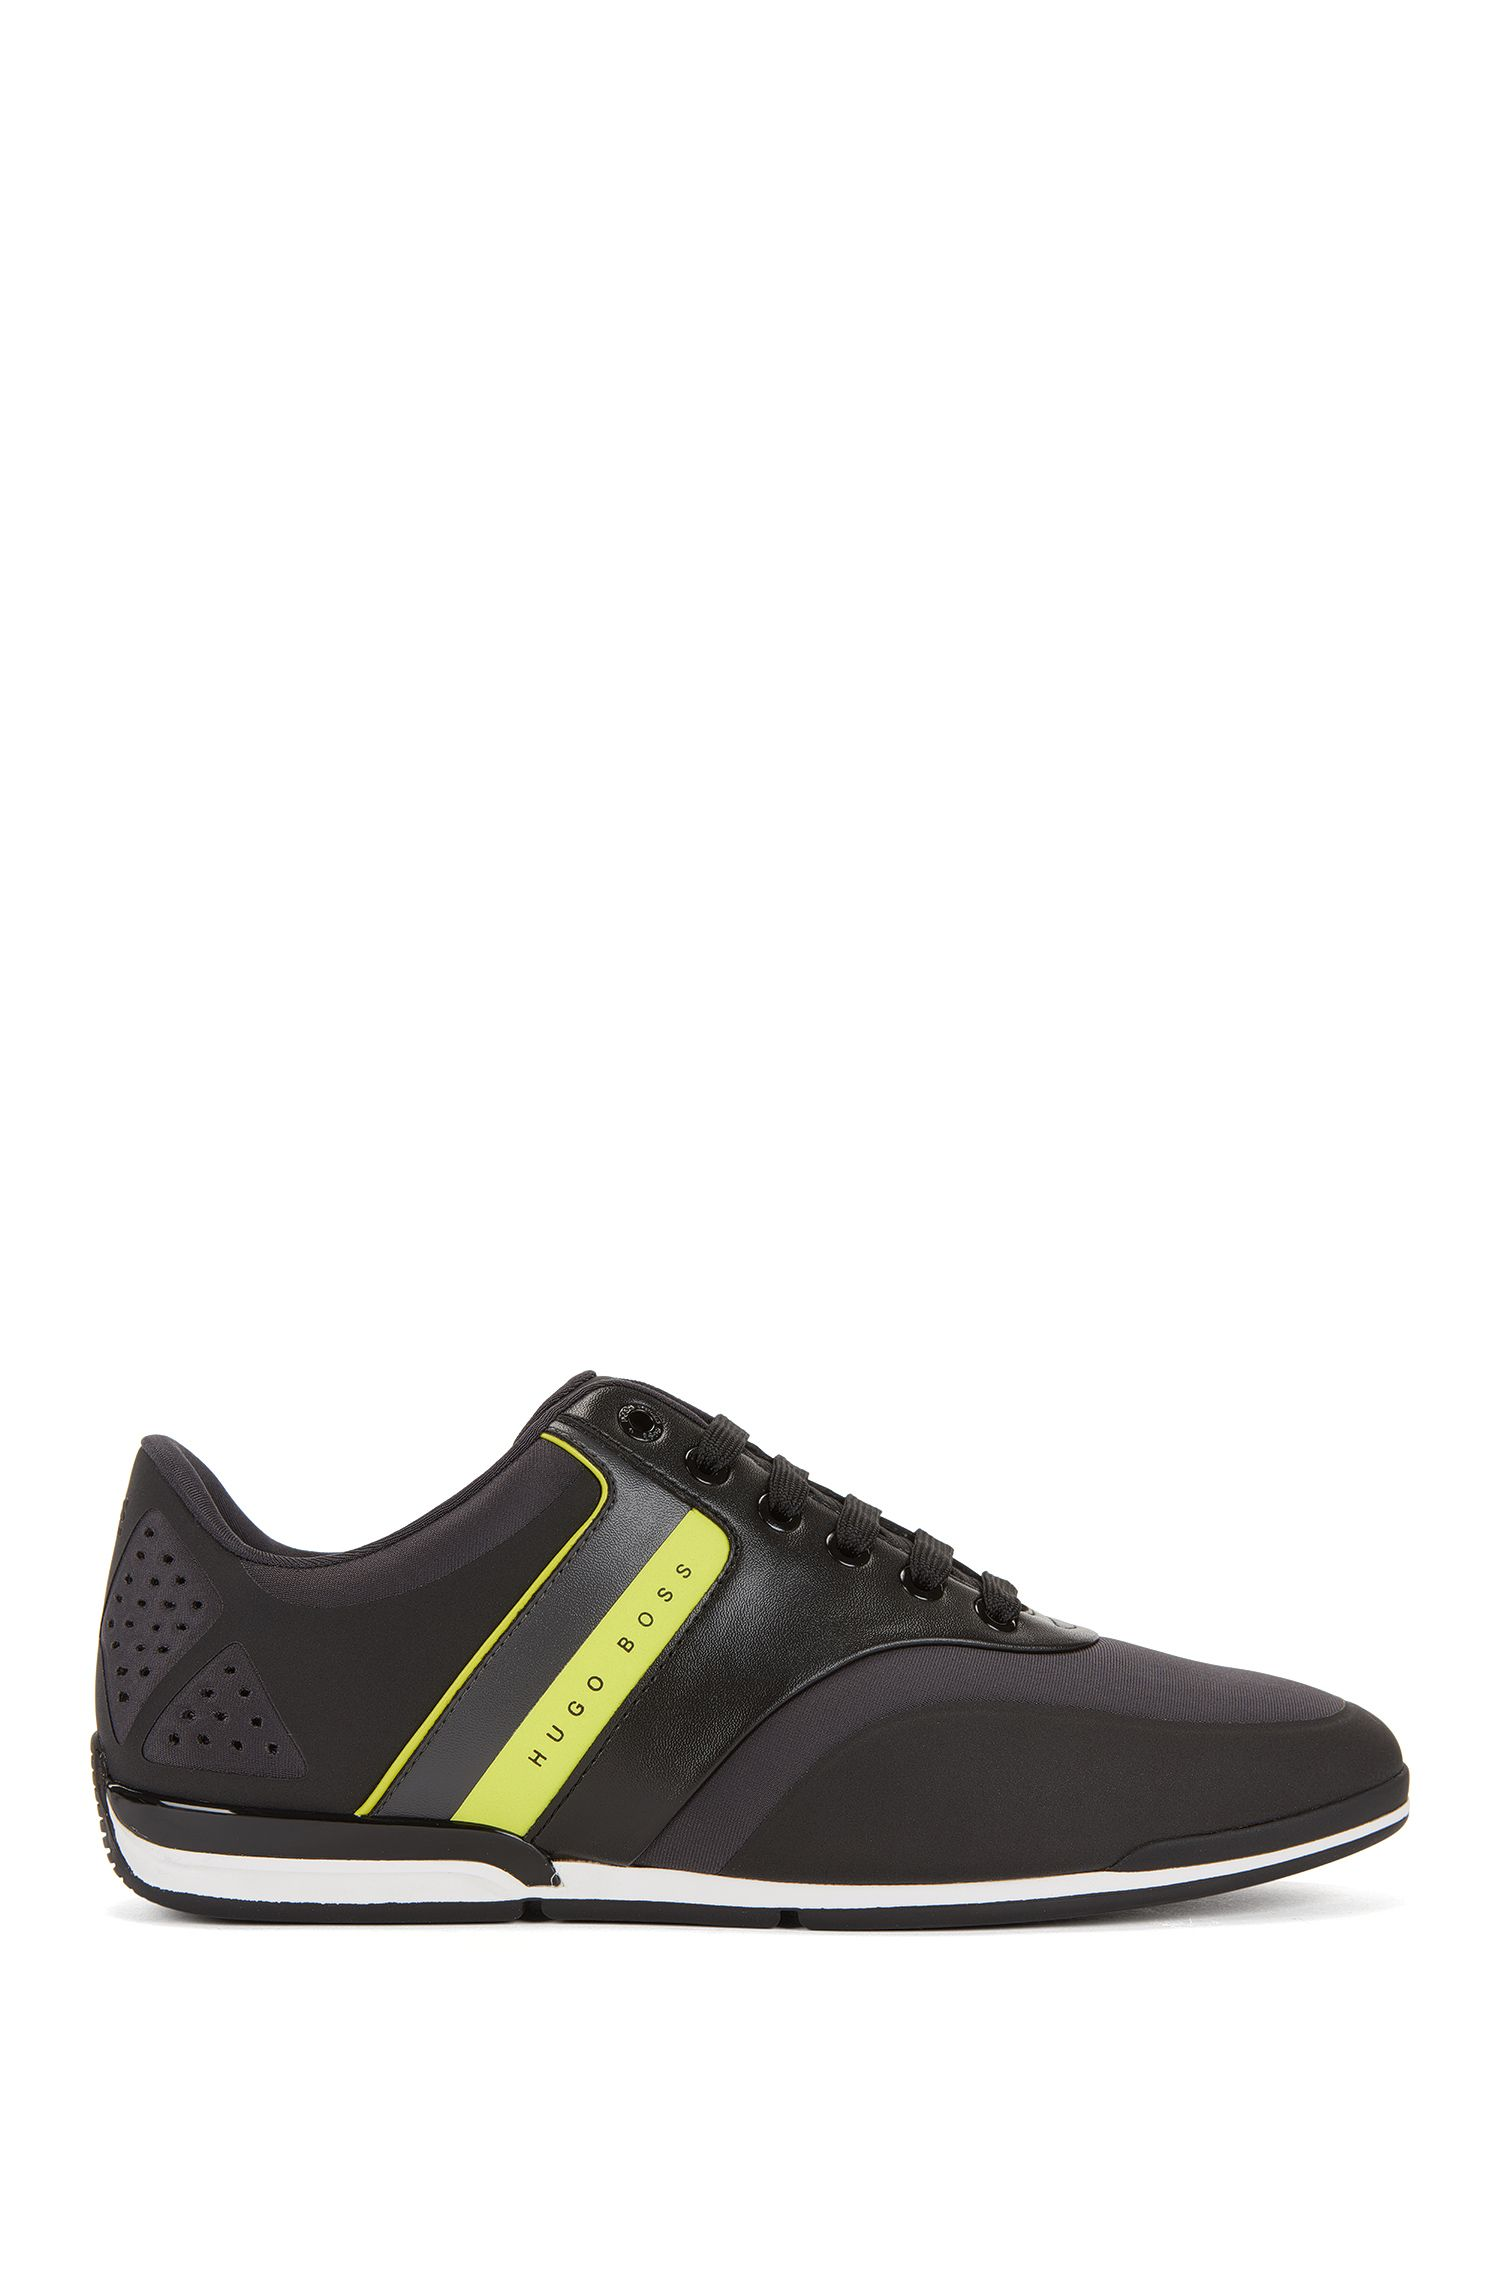 Lowtop Sneakers aus Neopren mit Streifen